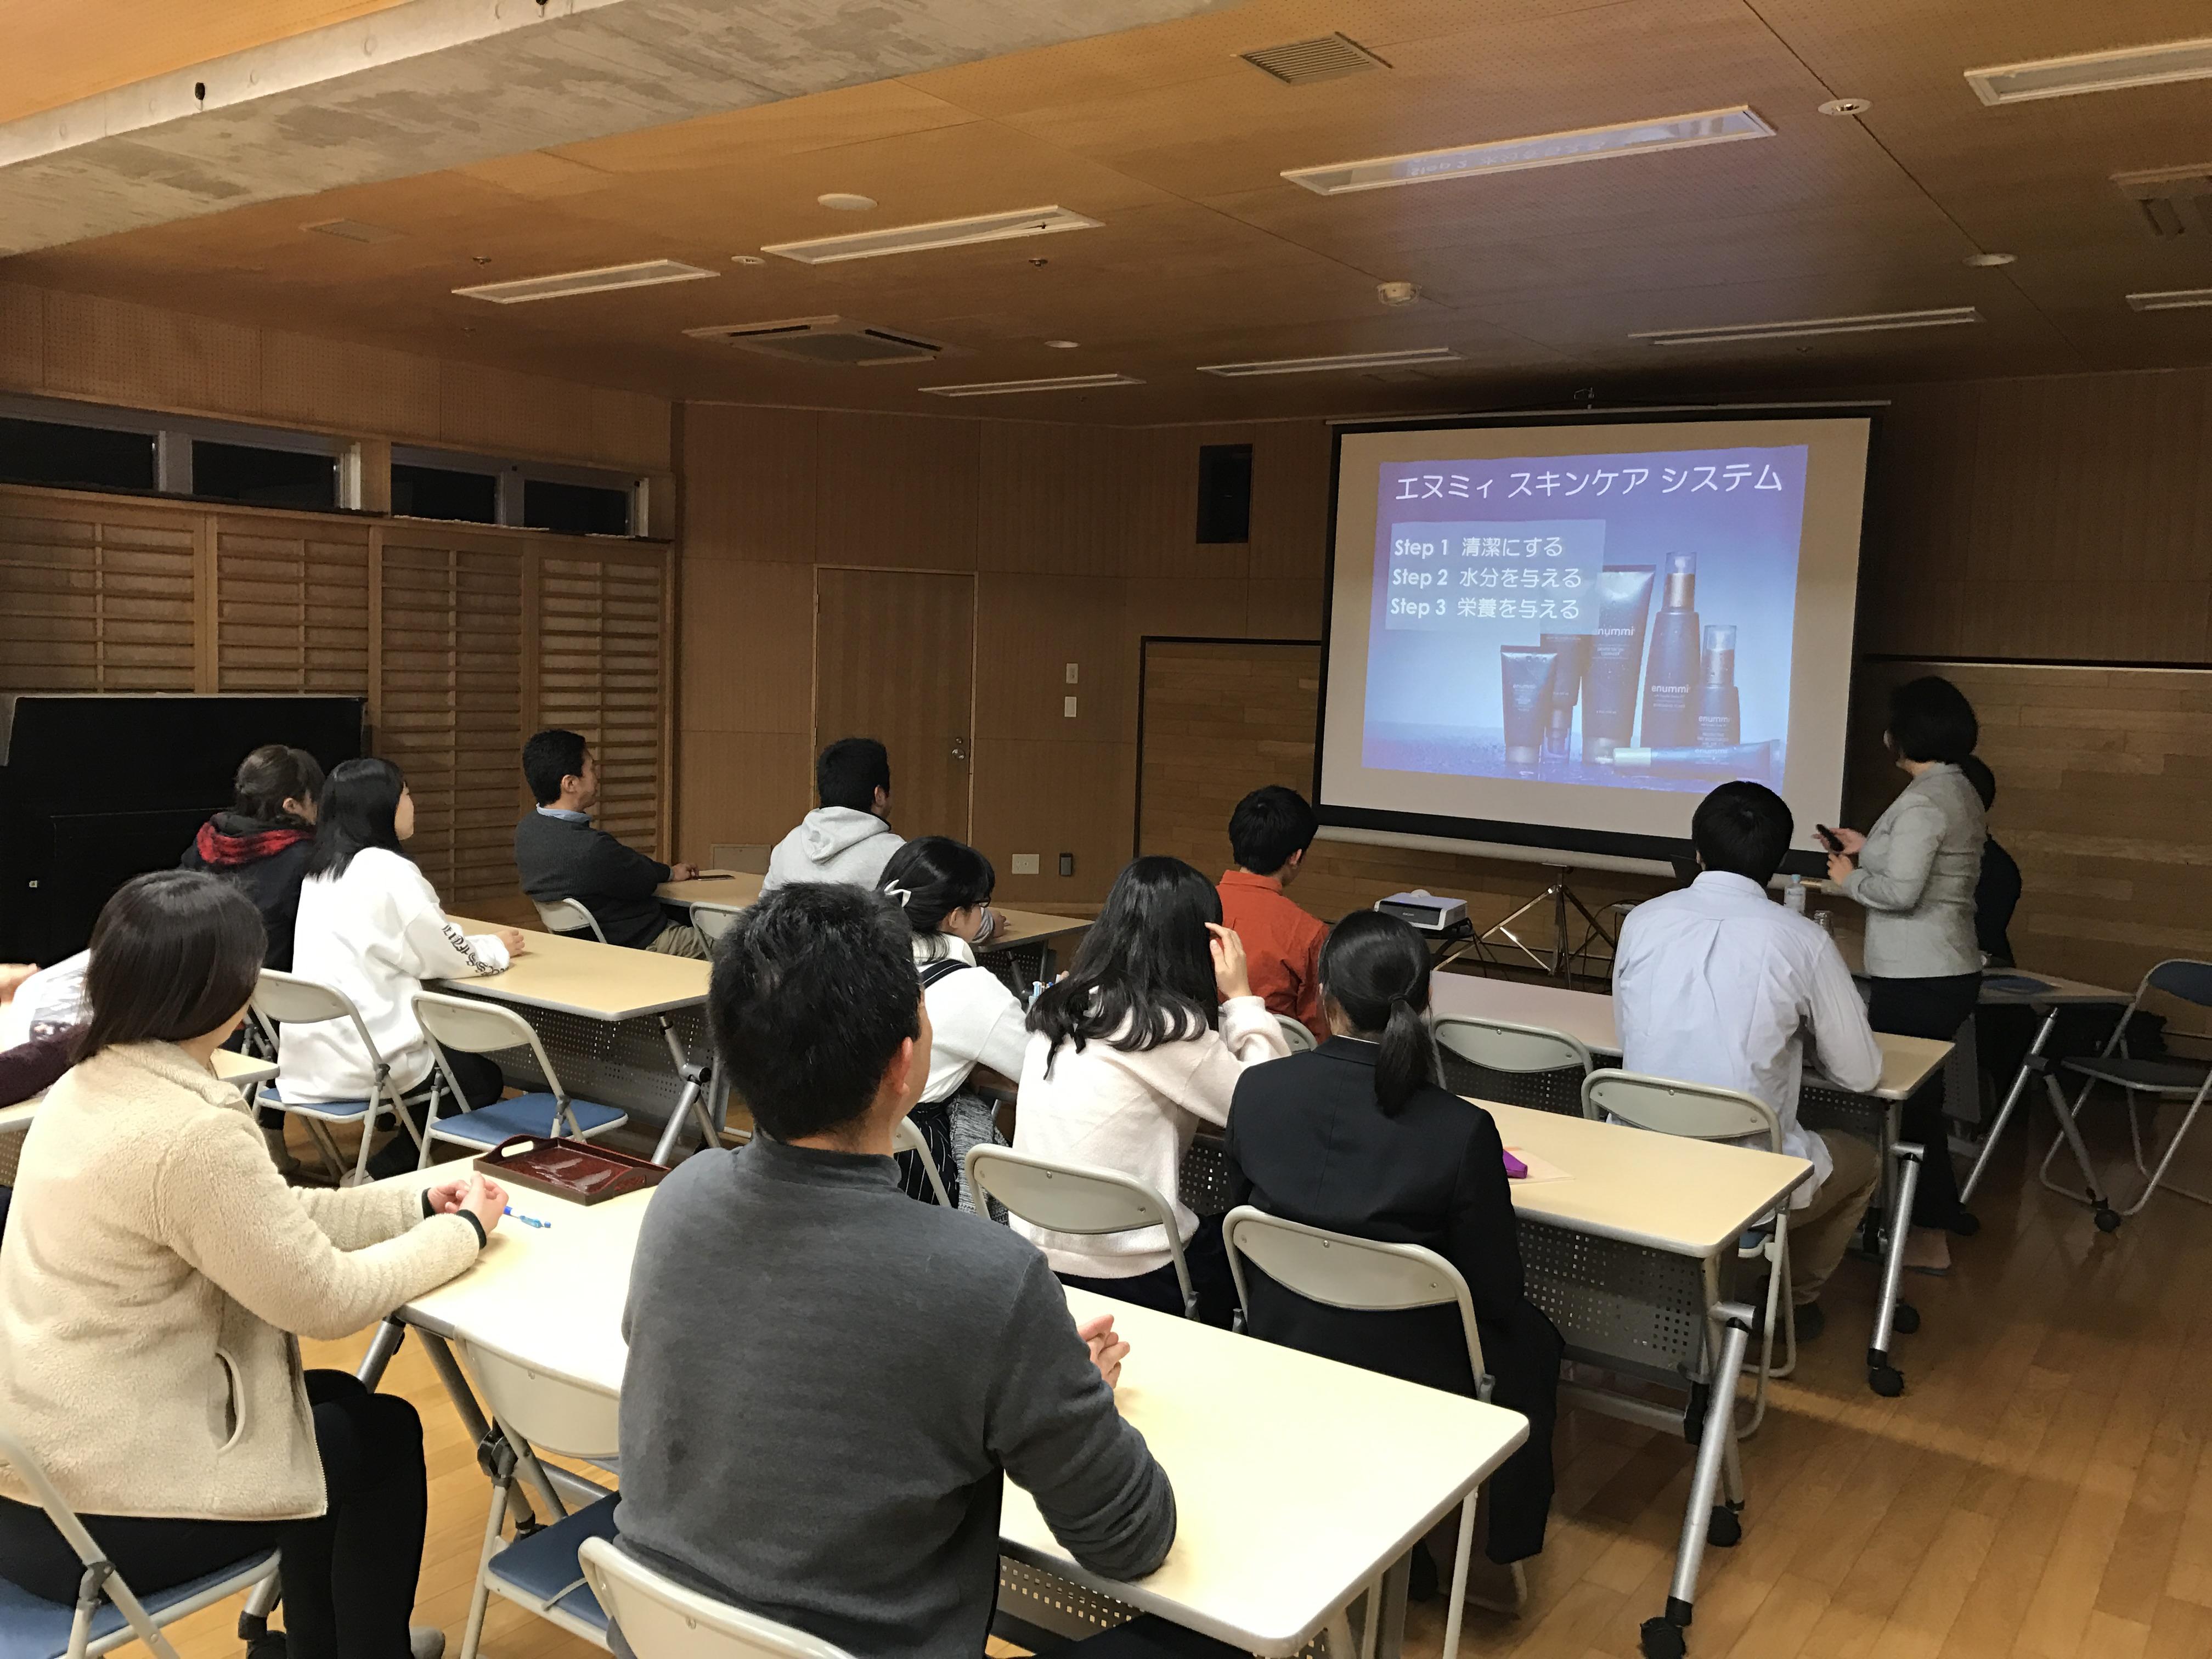 4Life Japan Hosts Student Visit